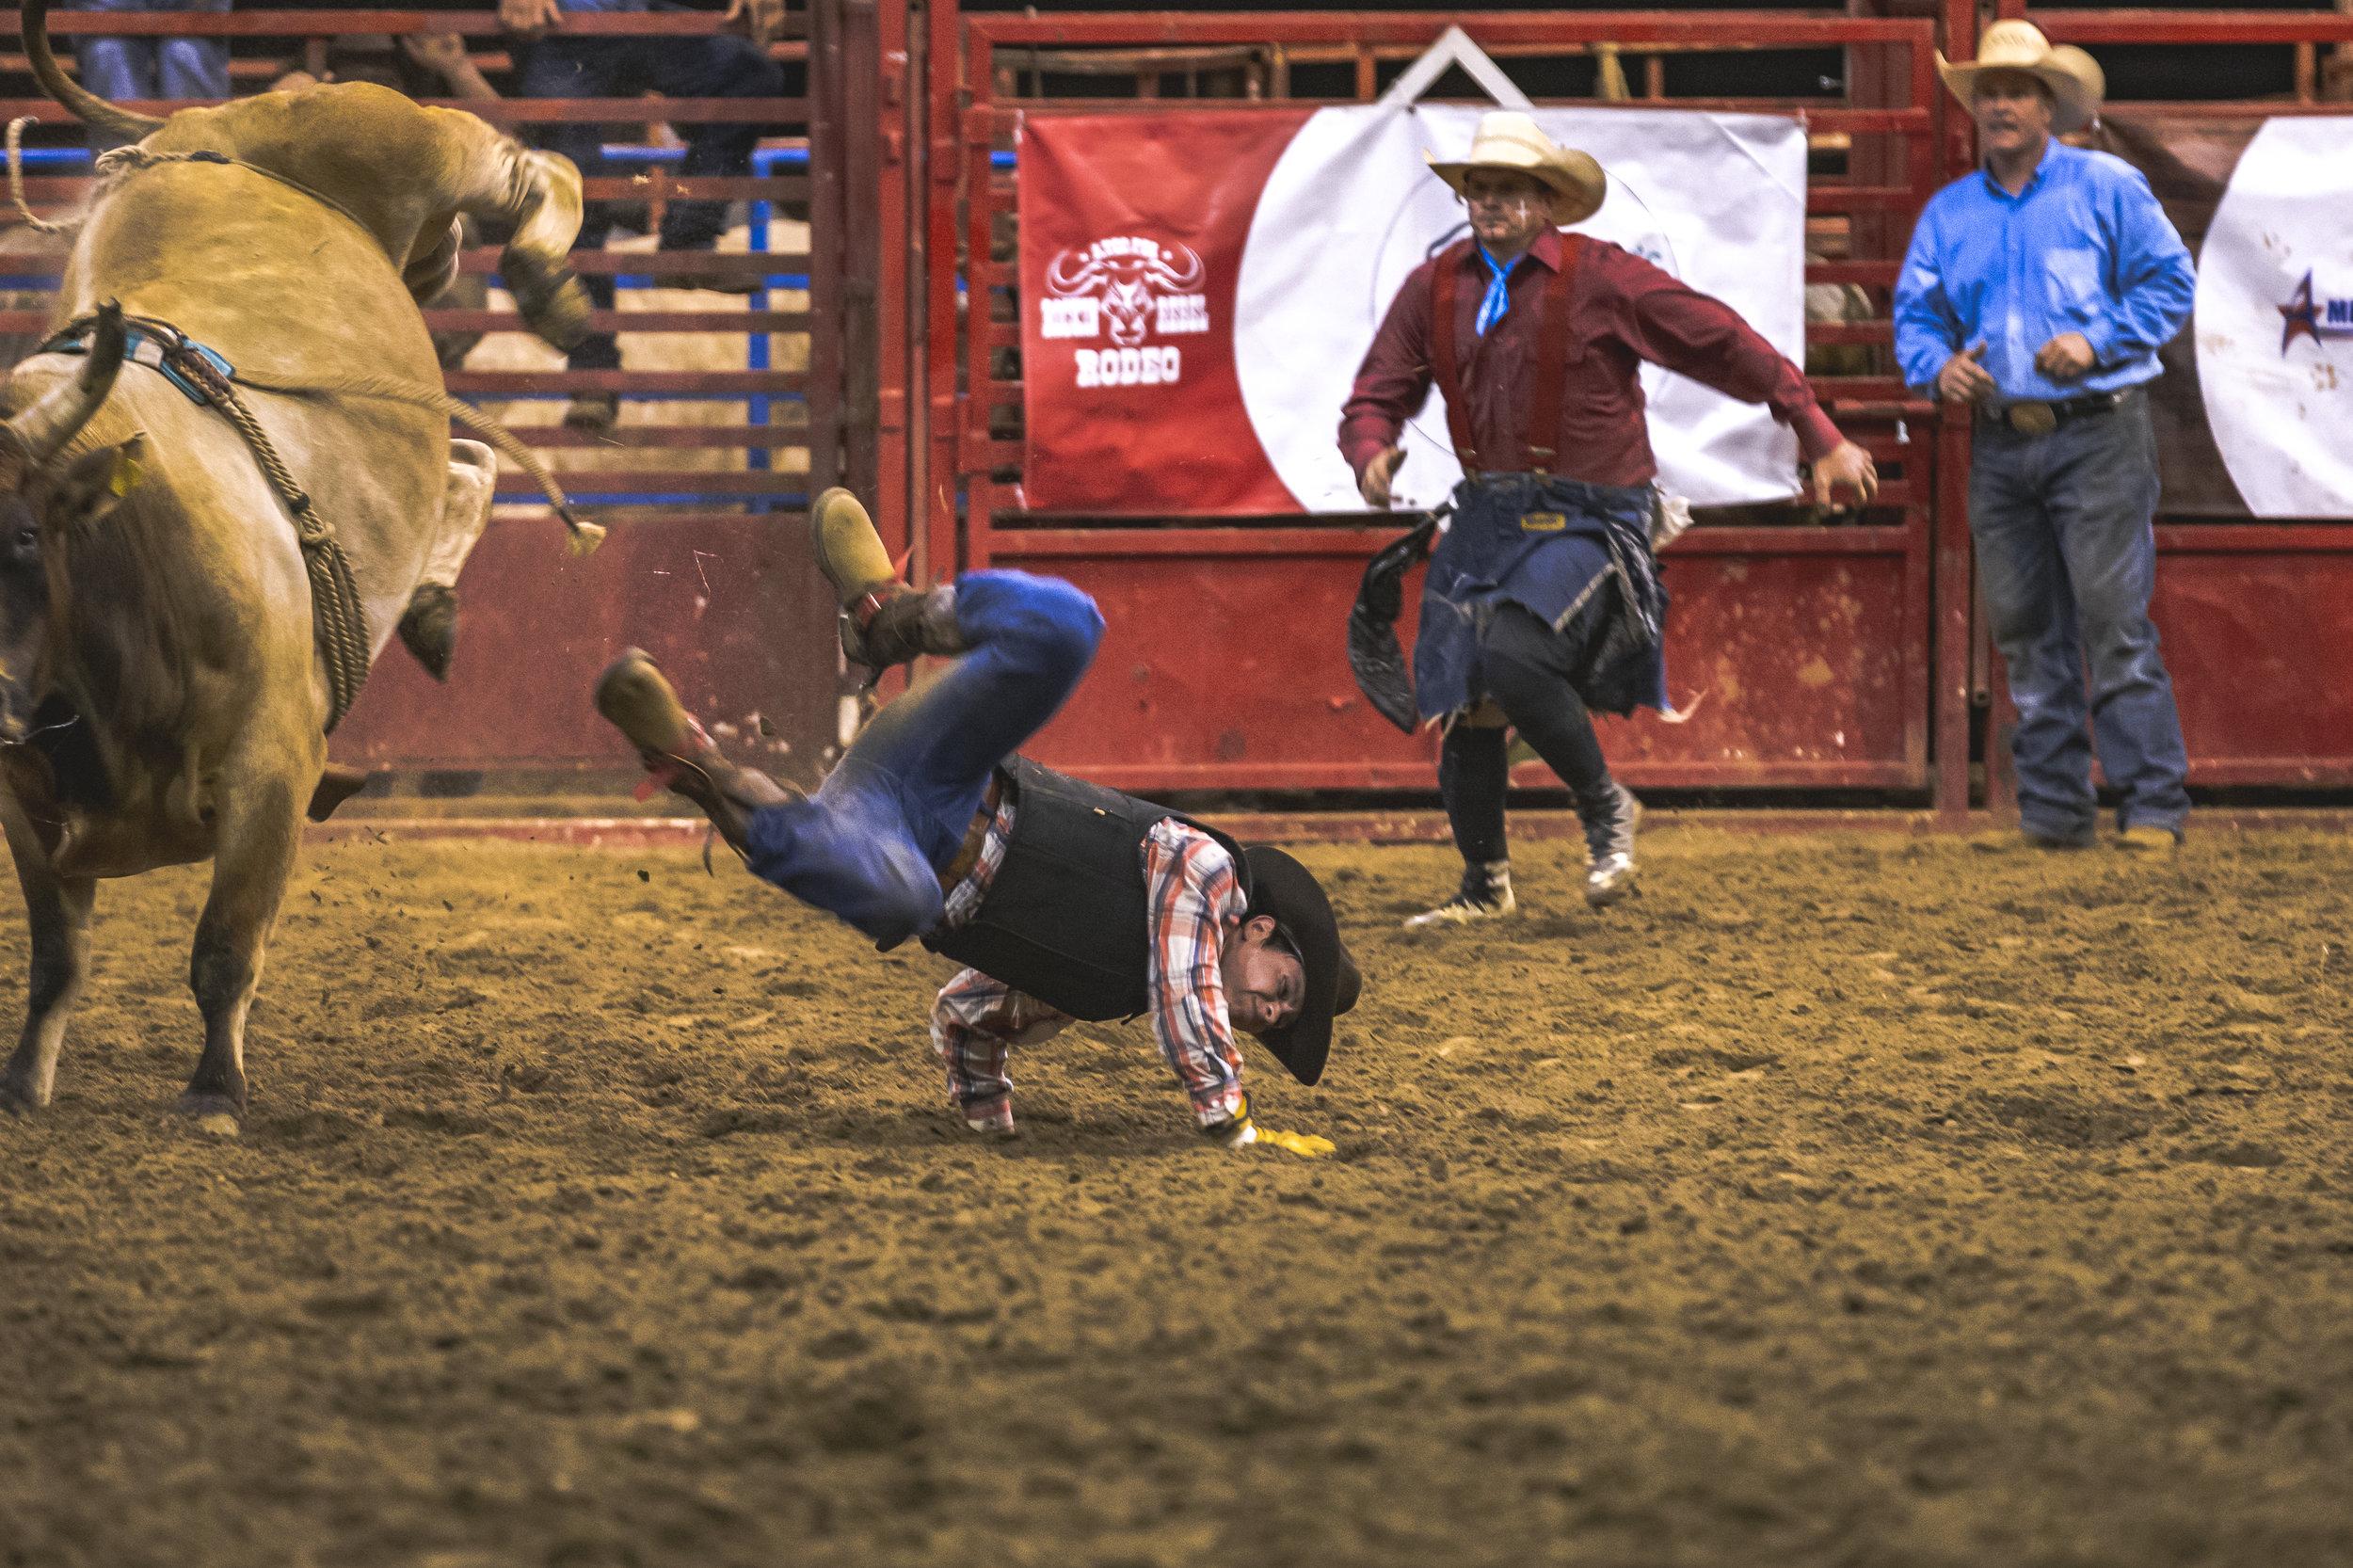 atco-rodeo-31.jpg